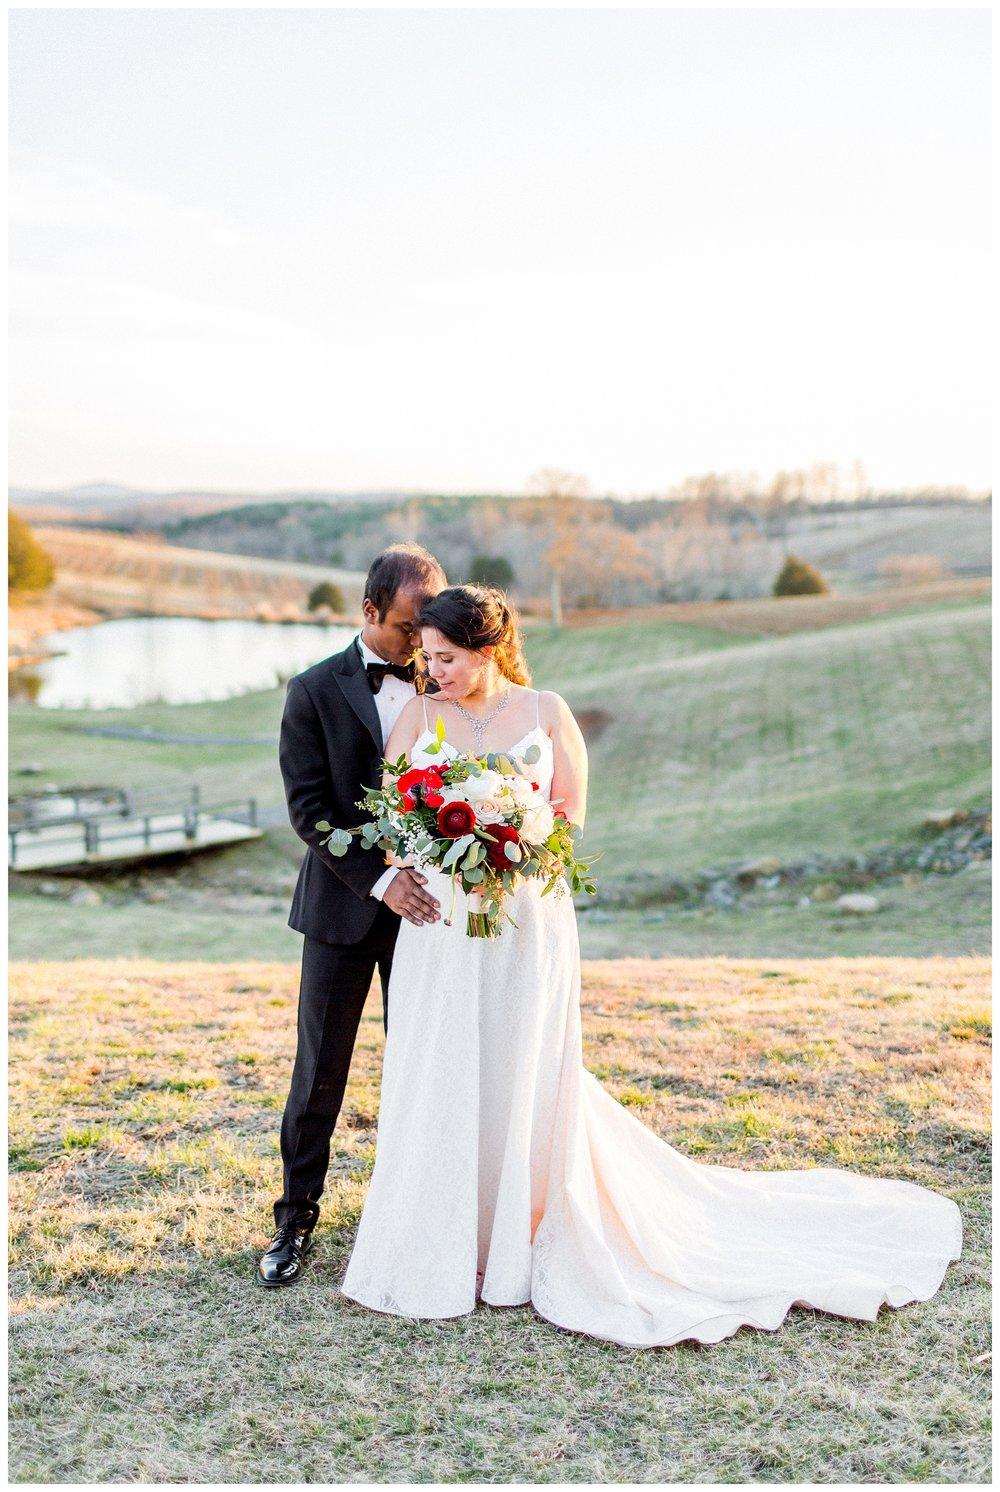 Stone Tower Winery Wedding | Virginia Winter Wedding | VA Wedding Photographer Kir Tuben_0108.jpg